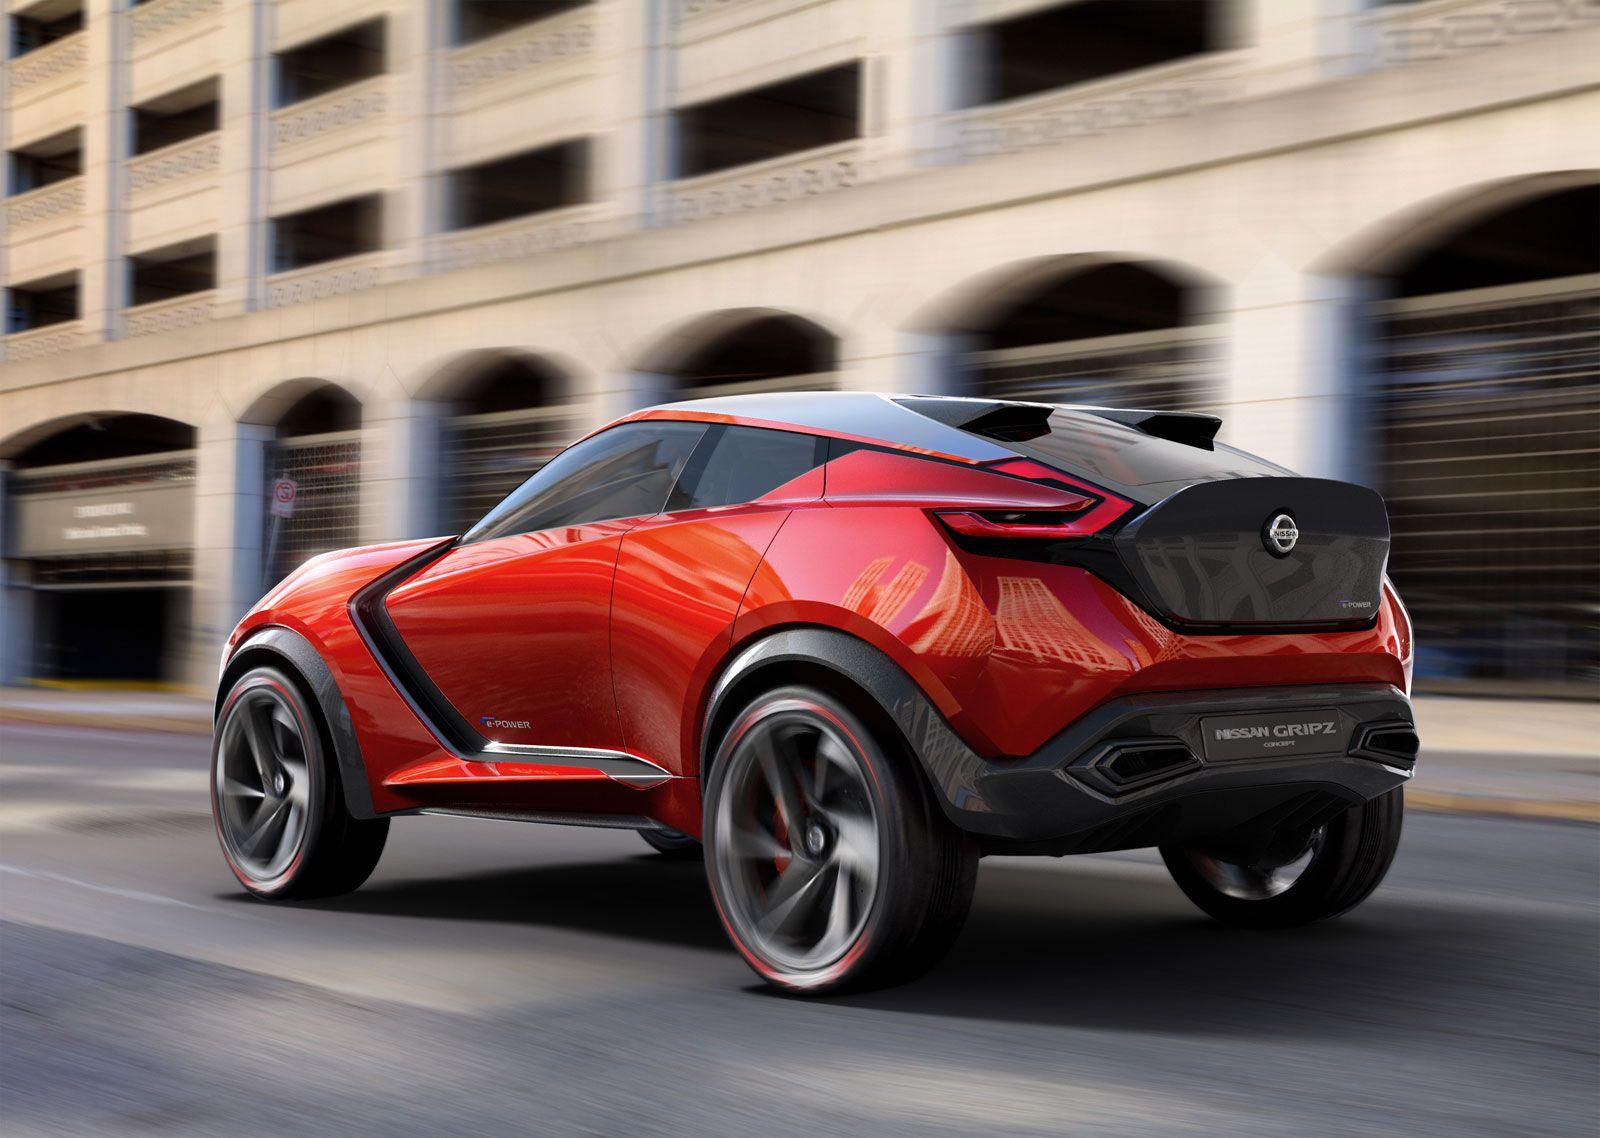 Nissan Gripz Concept Rendering